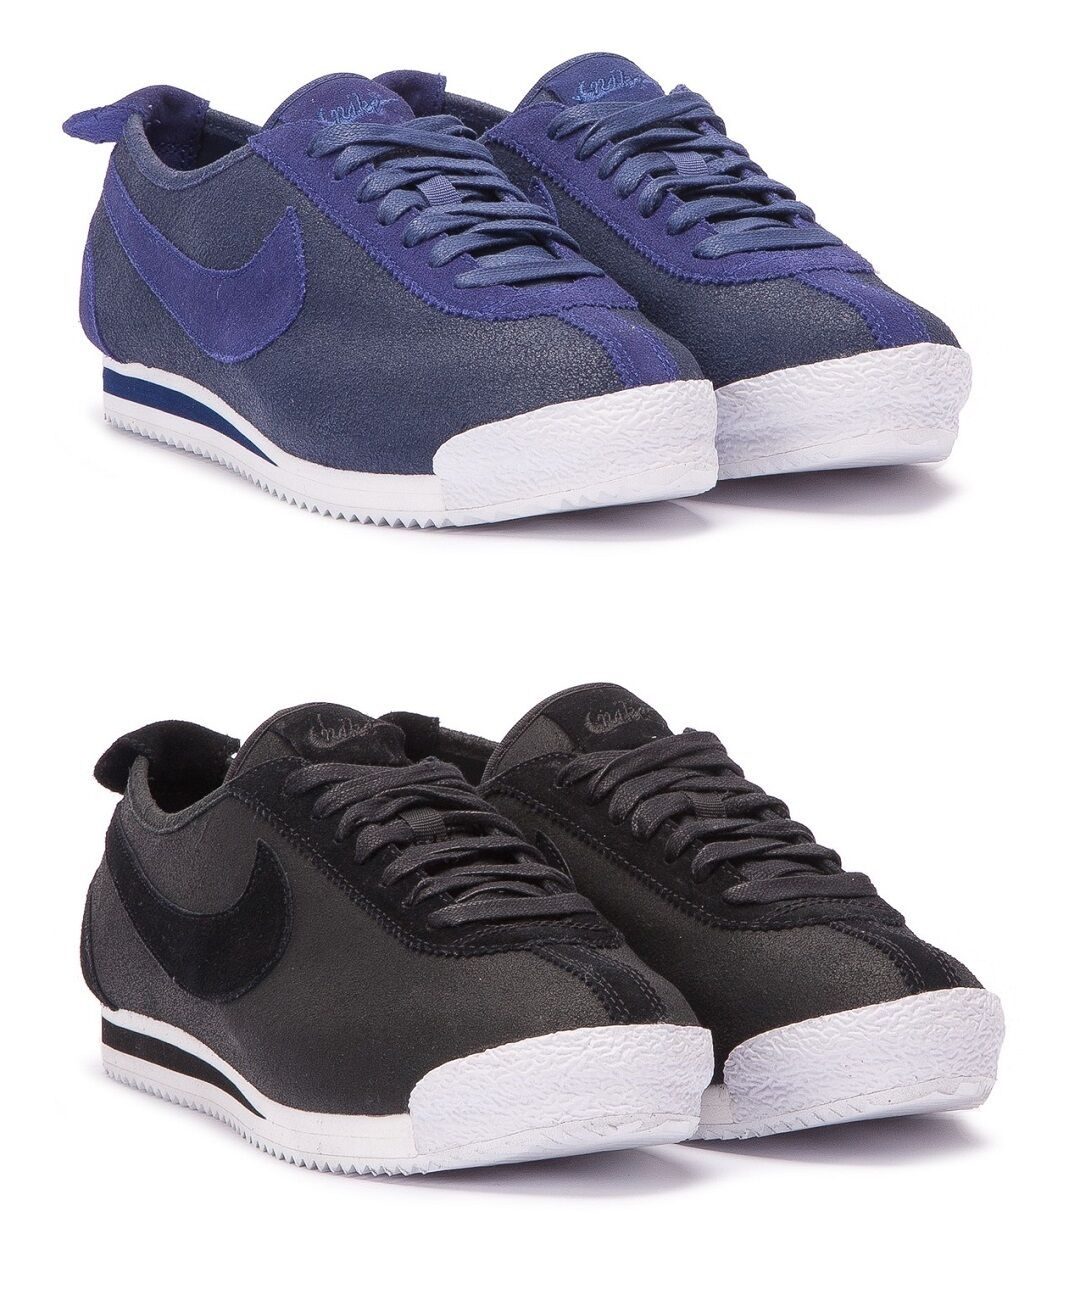 sale retailer fc931 1eda3 Nike Cortez 72. Classic Vintage Suede Trainers